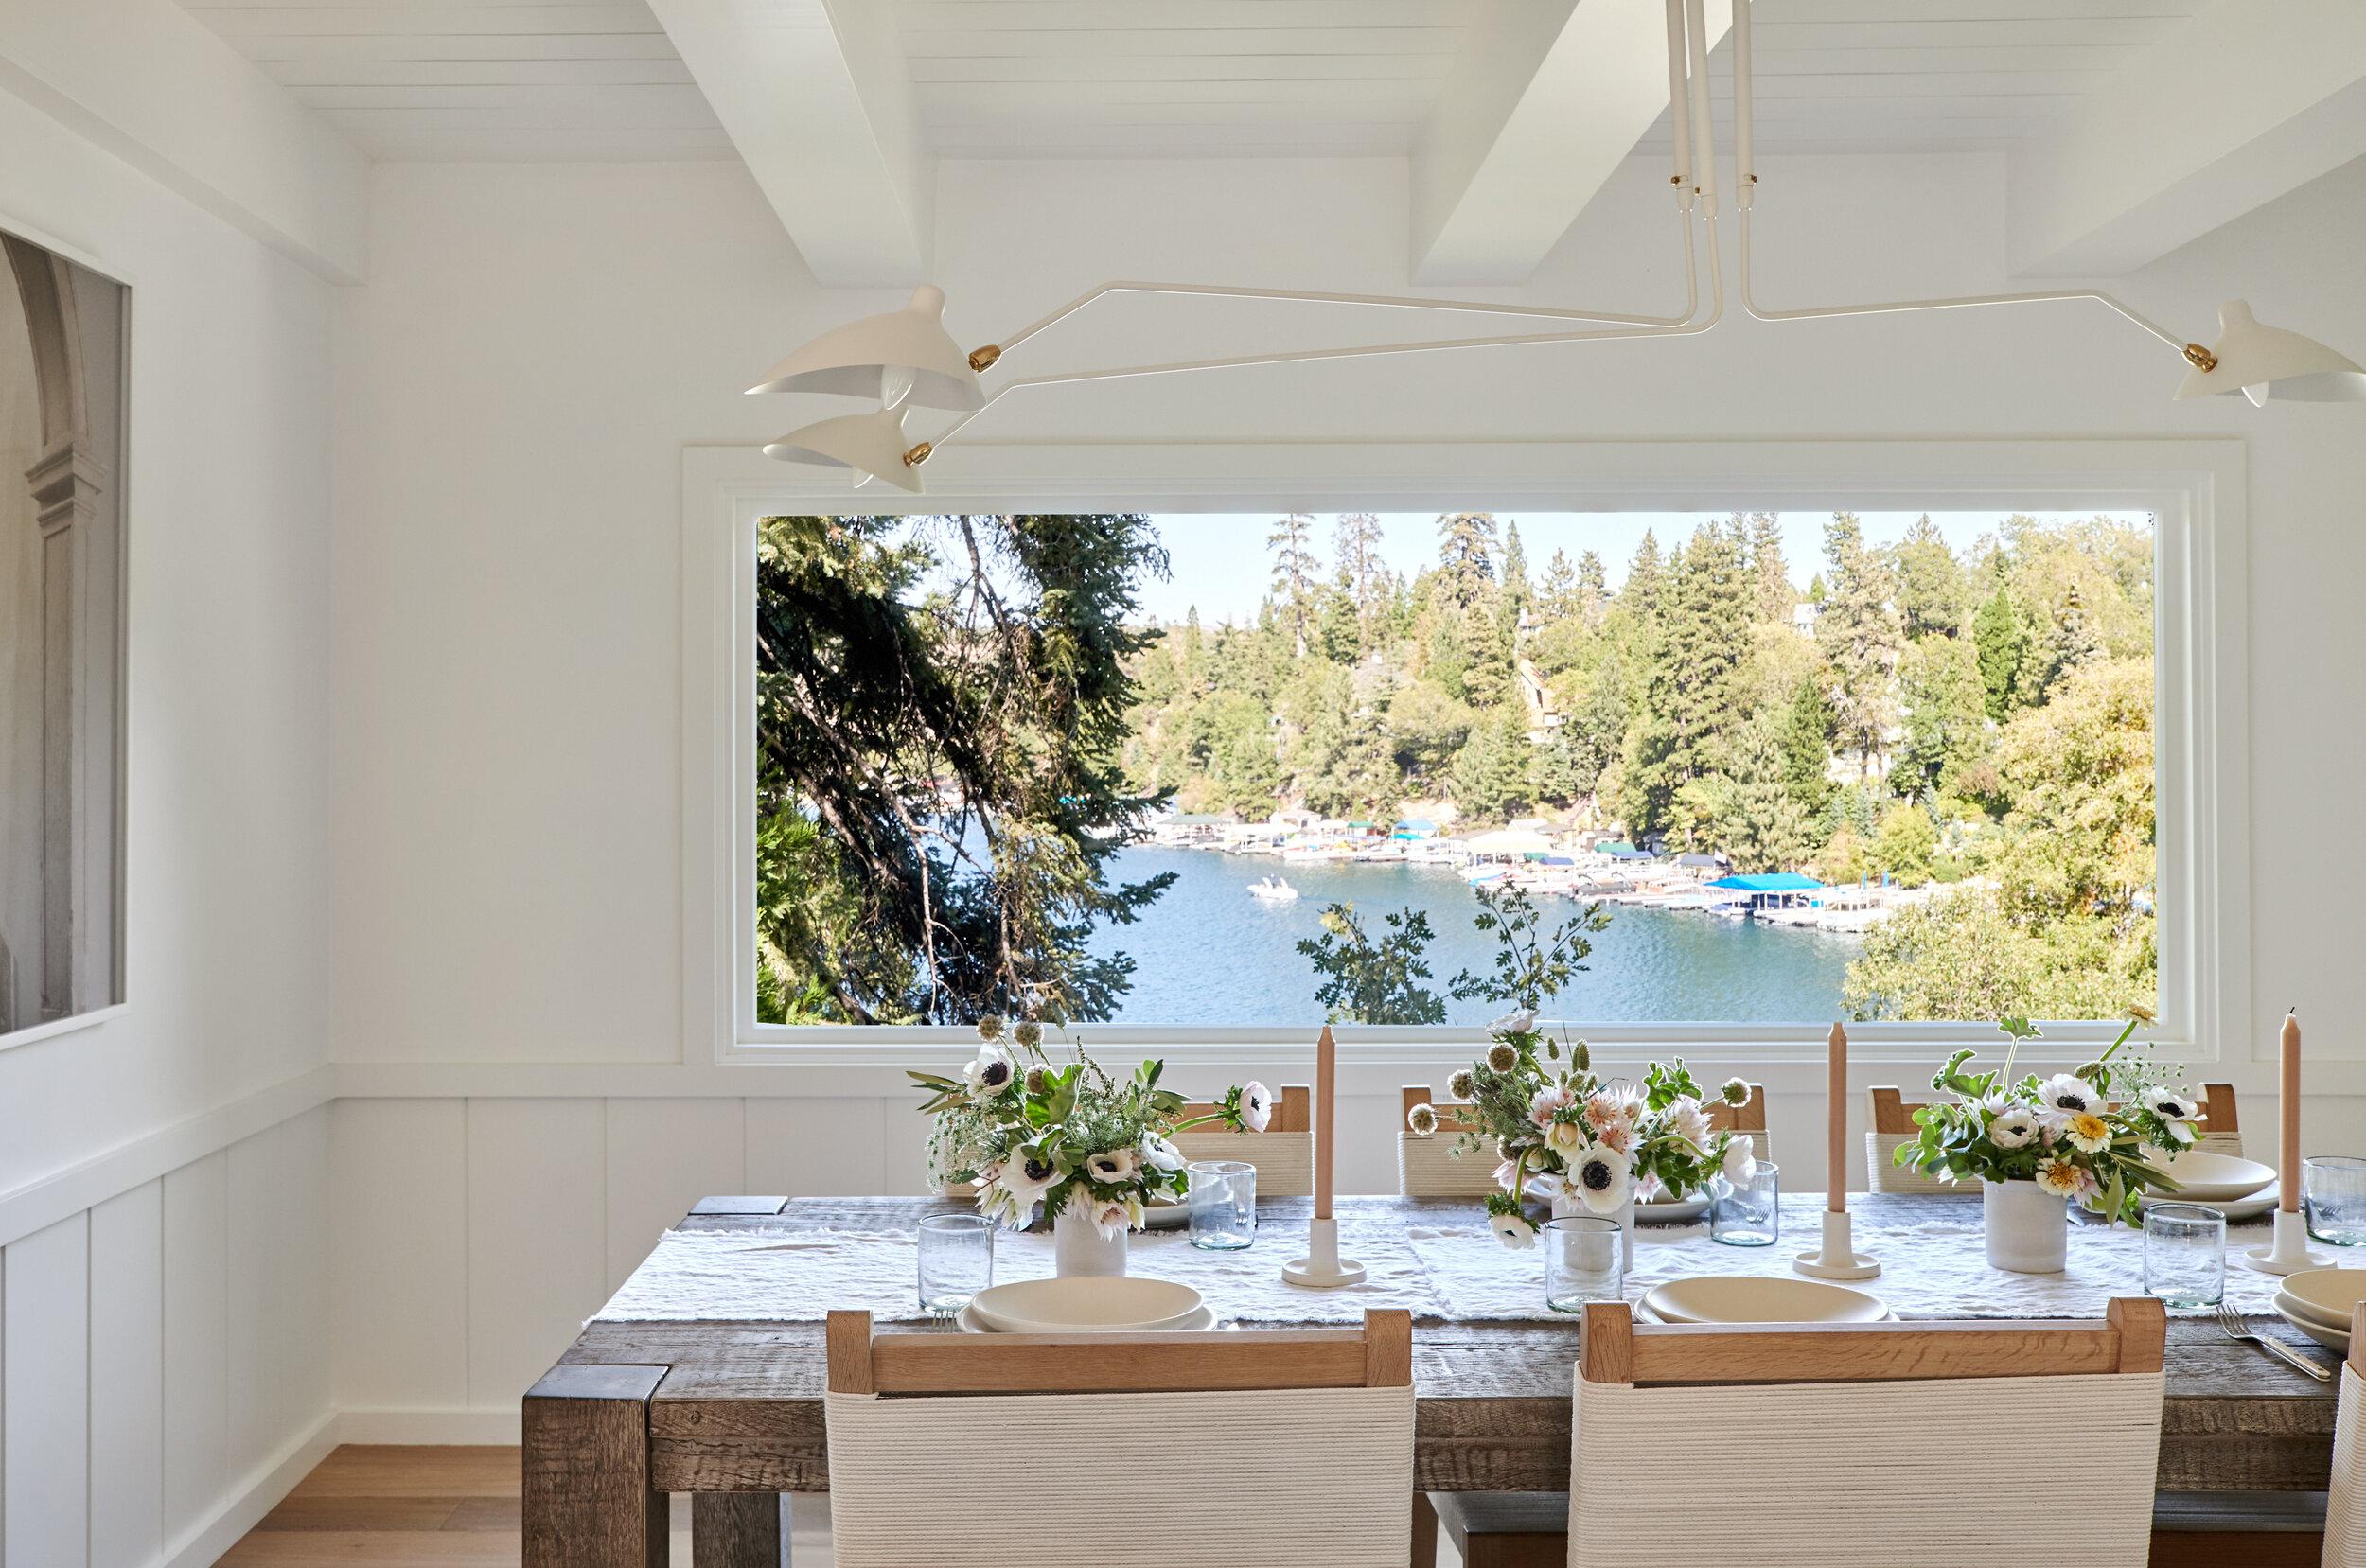 The Idyllic Jenni Kayne Lake House is For Sale! — Jenna ... on lake house dock signs, lake house dock ideas, cabin dock designs,